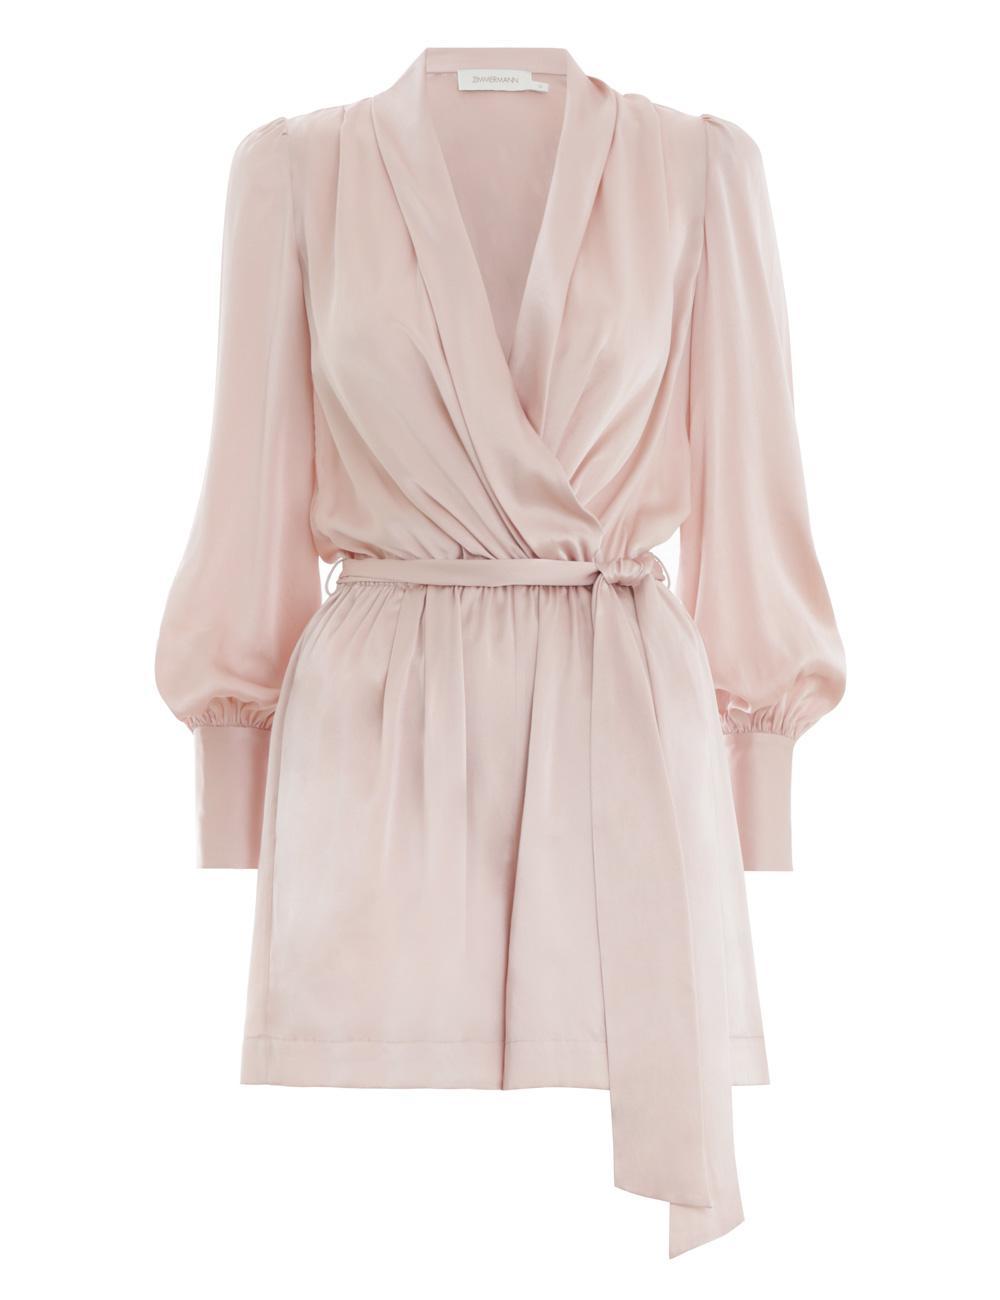 af2b727c5ca Lyst - Zimmermann Wrap Playsuit in Pink